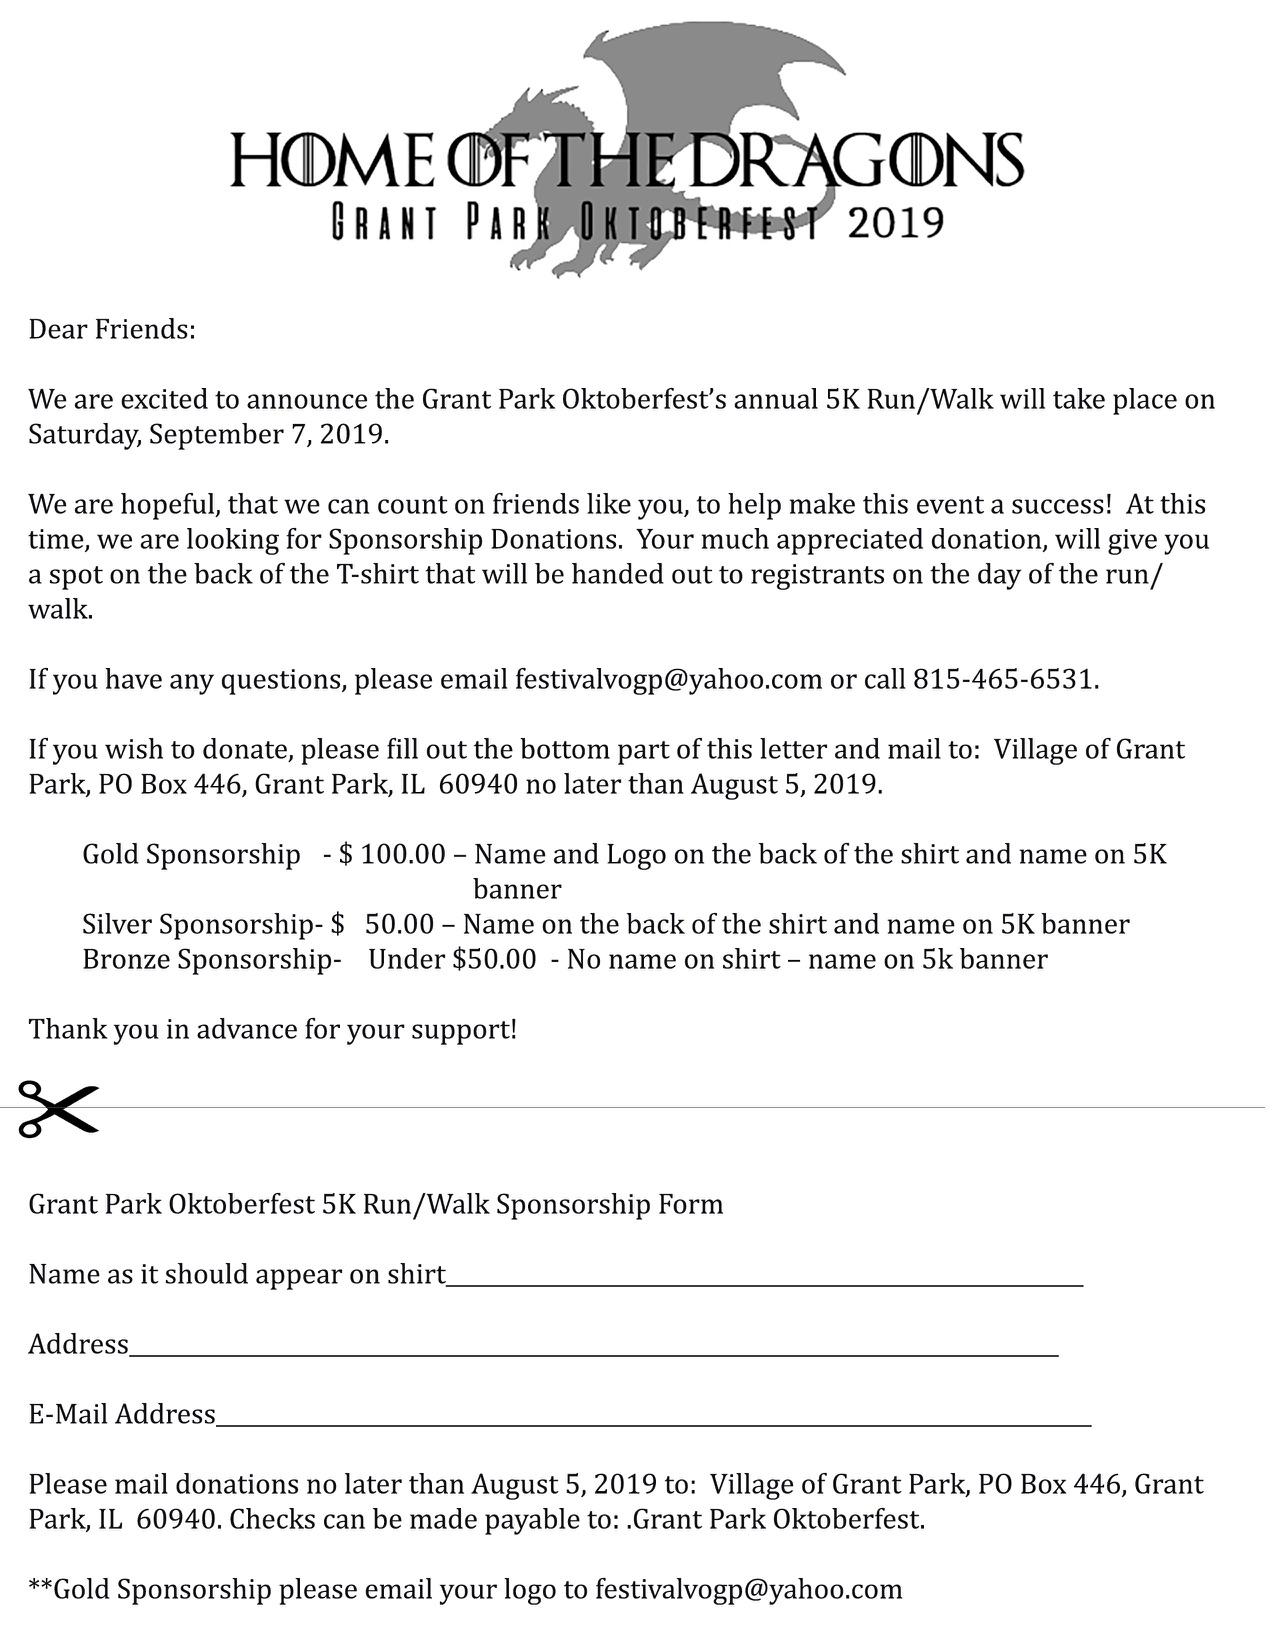 5k Sponsorship Form.jpg